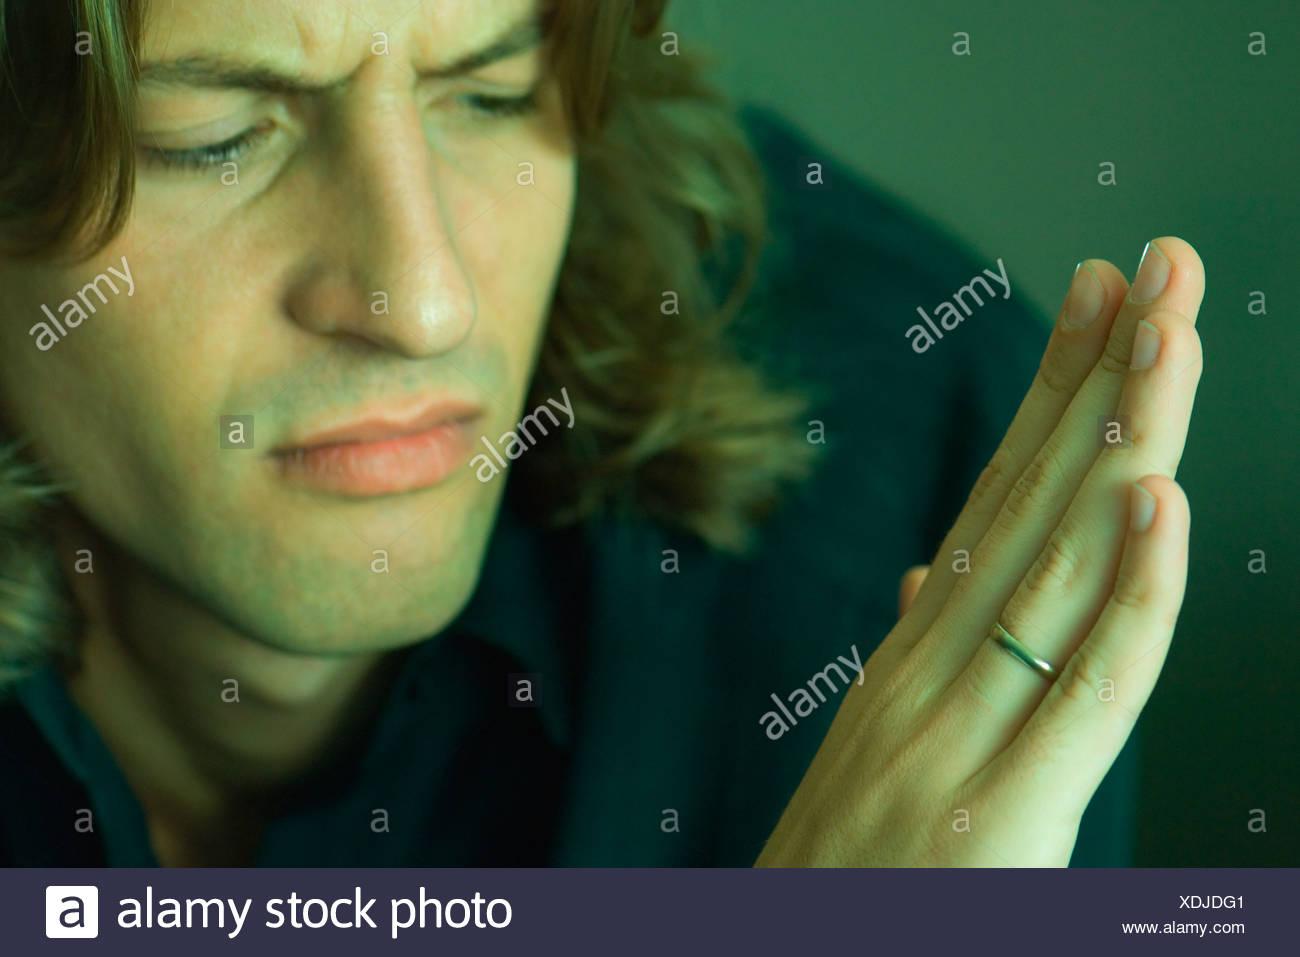 Man furrowing brow looking at own wedding ring - Stock Image